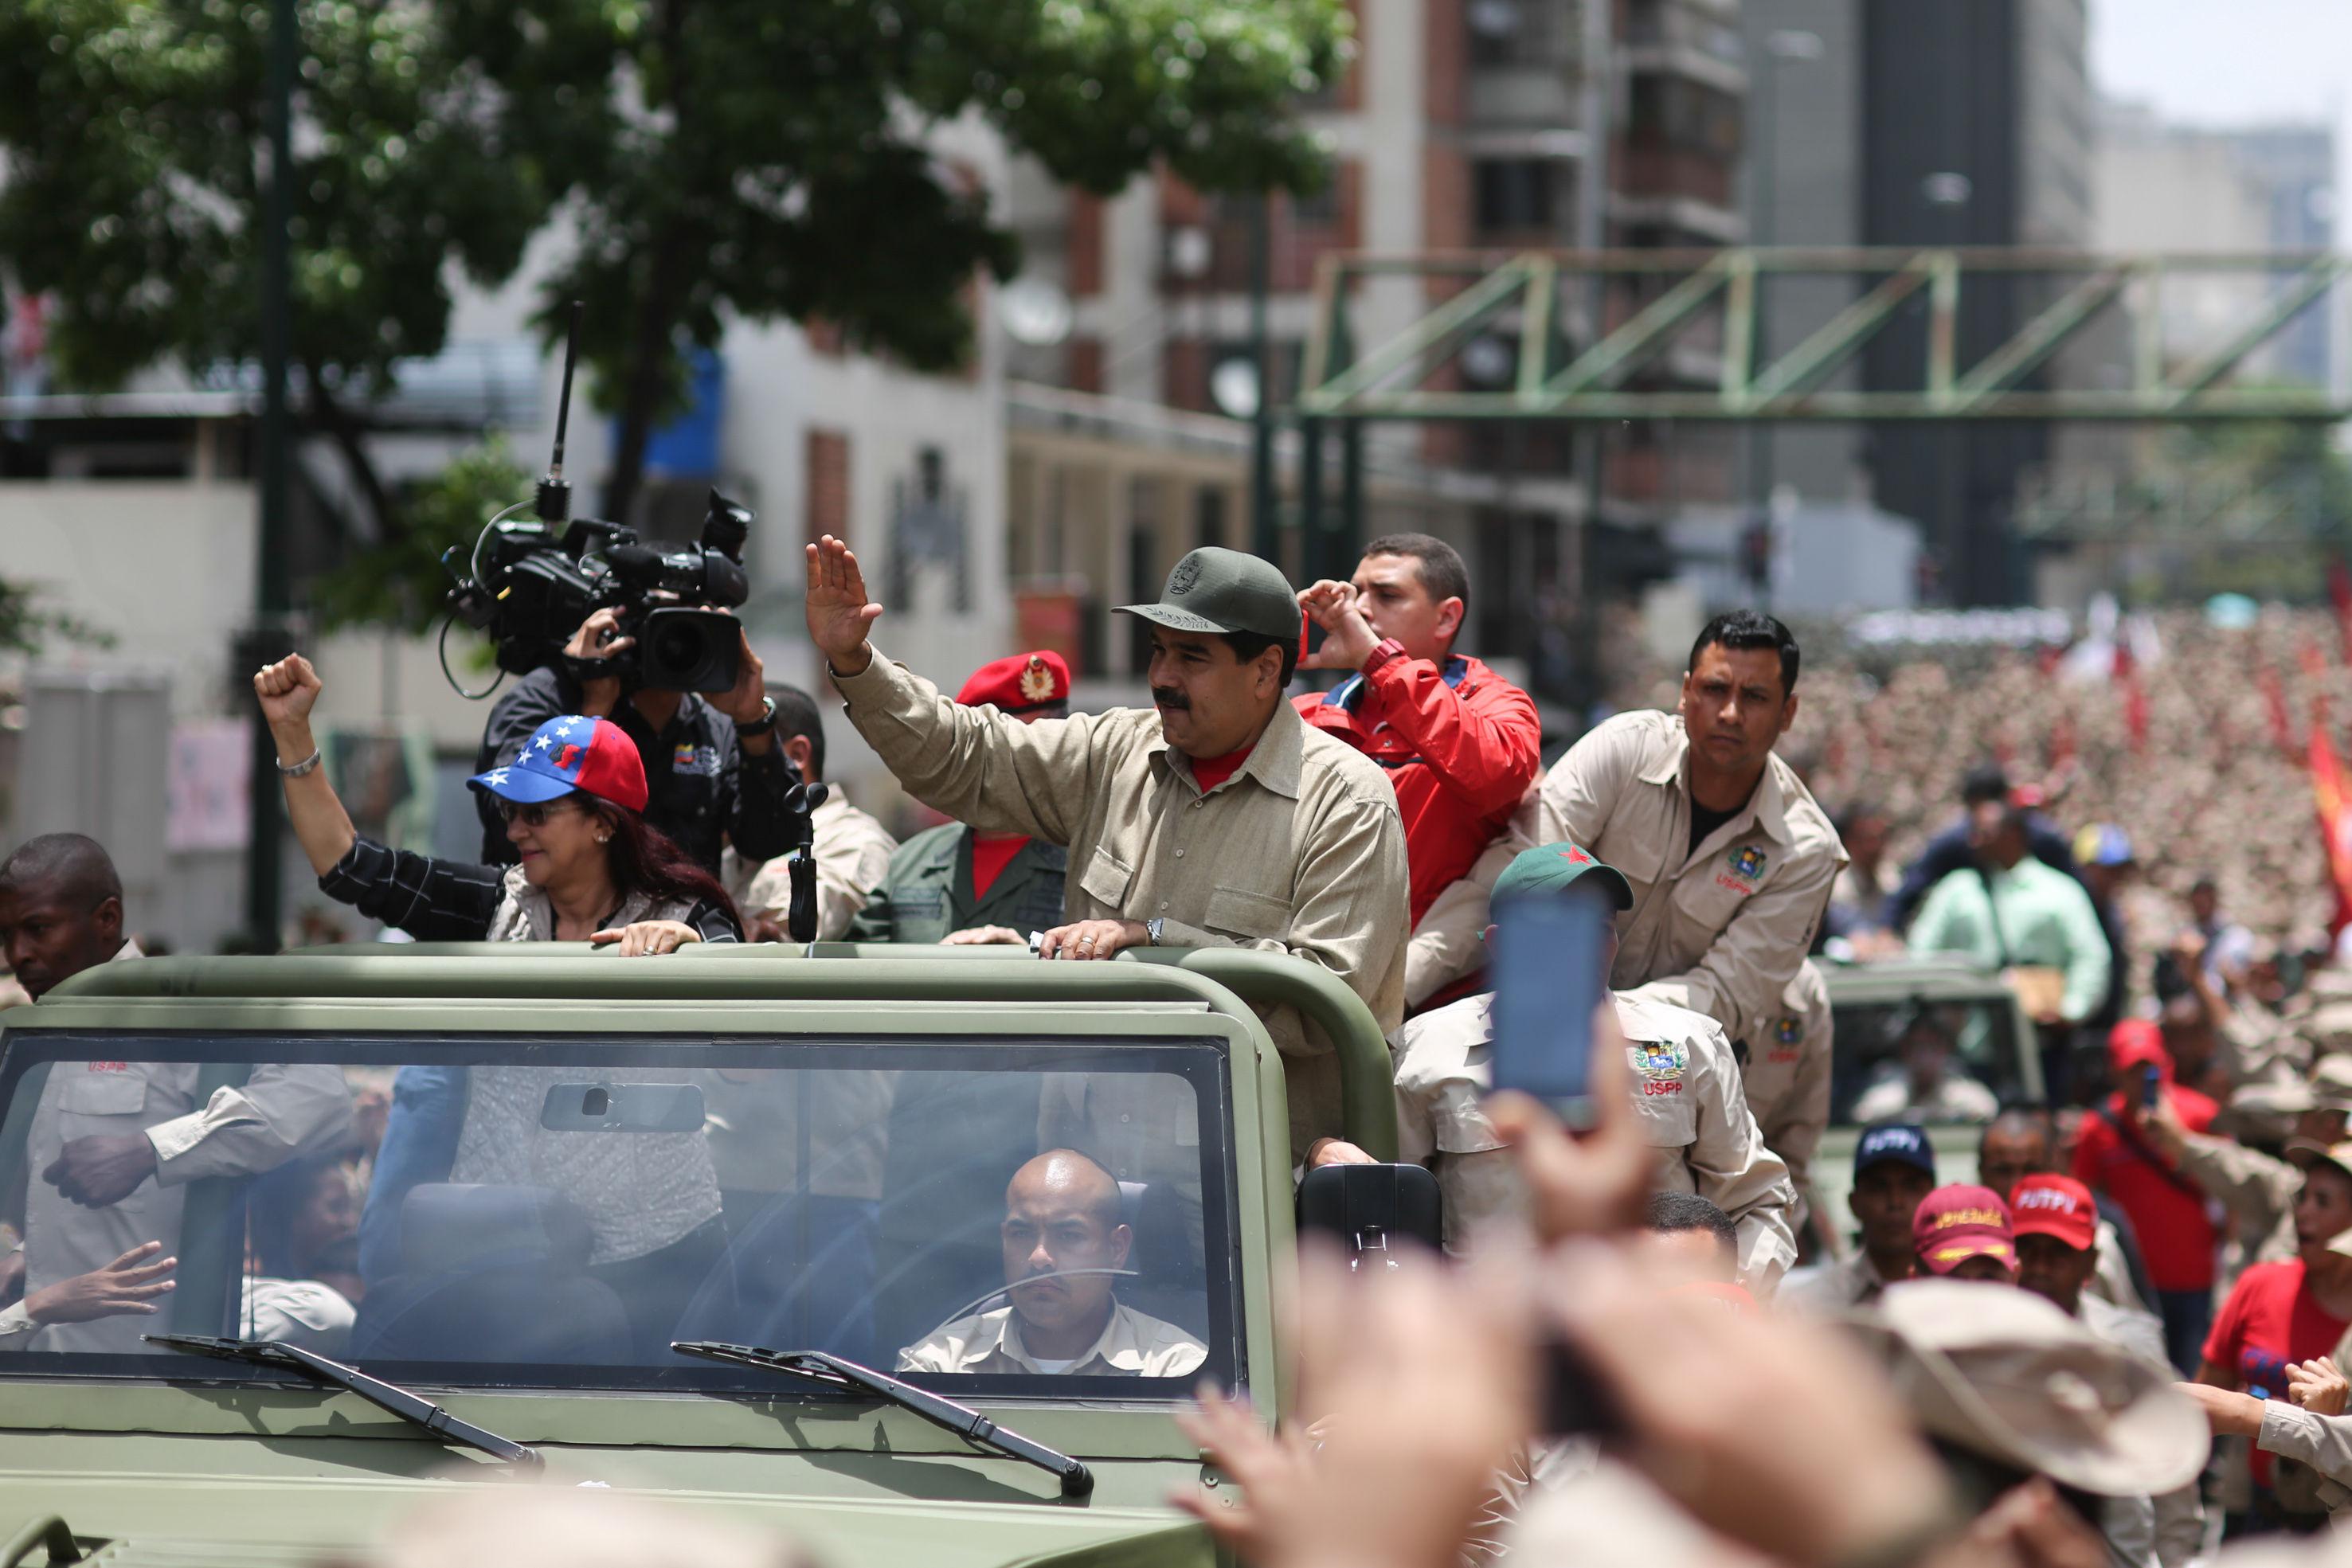 México reitera compromiso para esclarecer el caso Iguala